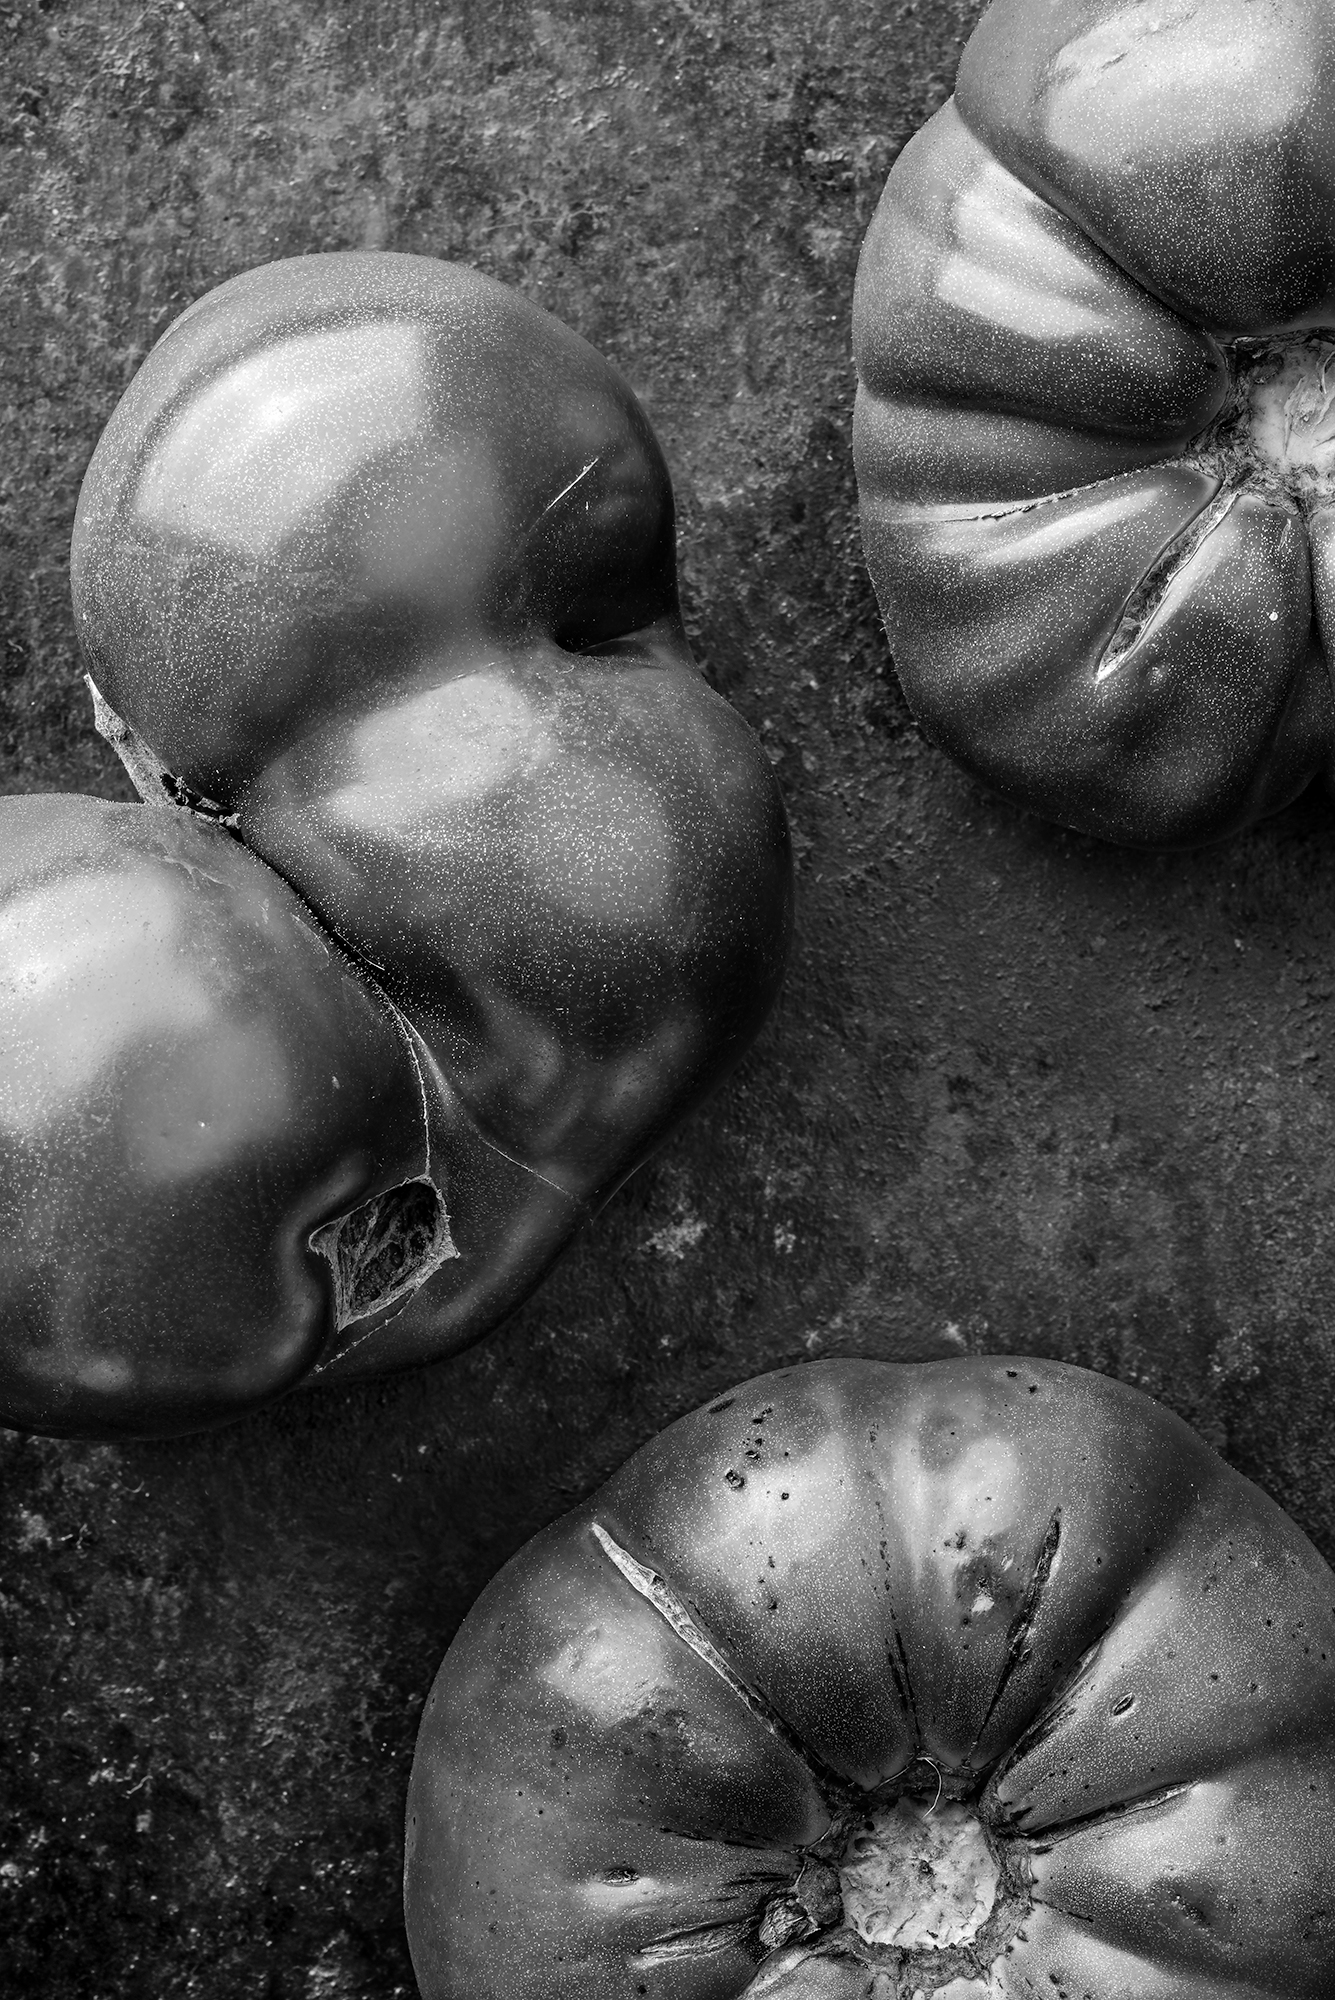 Farmer's Market, Heirloom Tomatoes